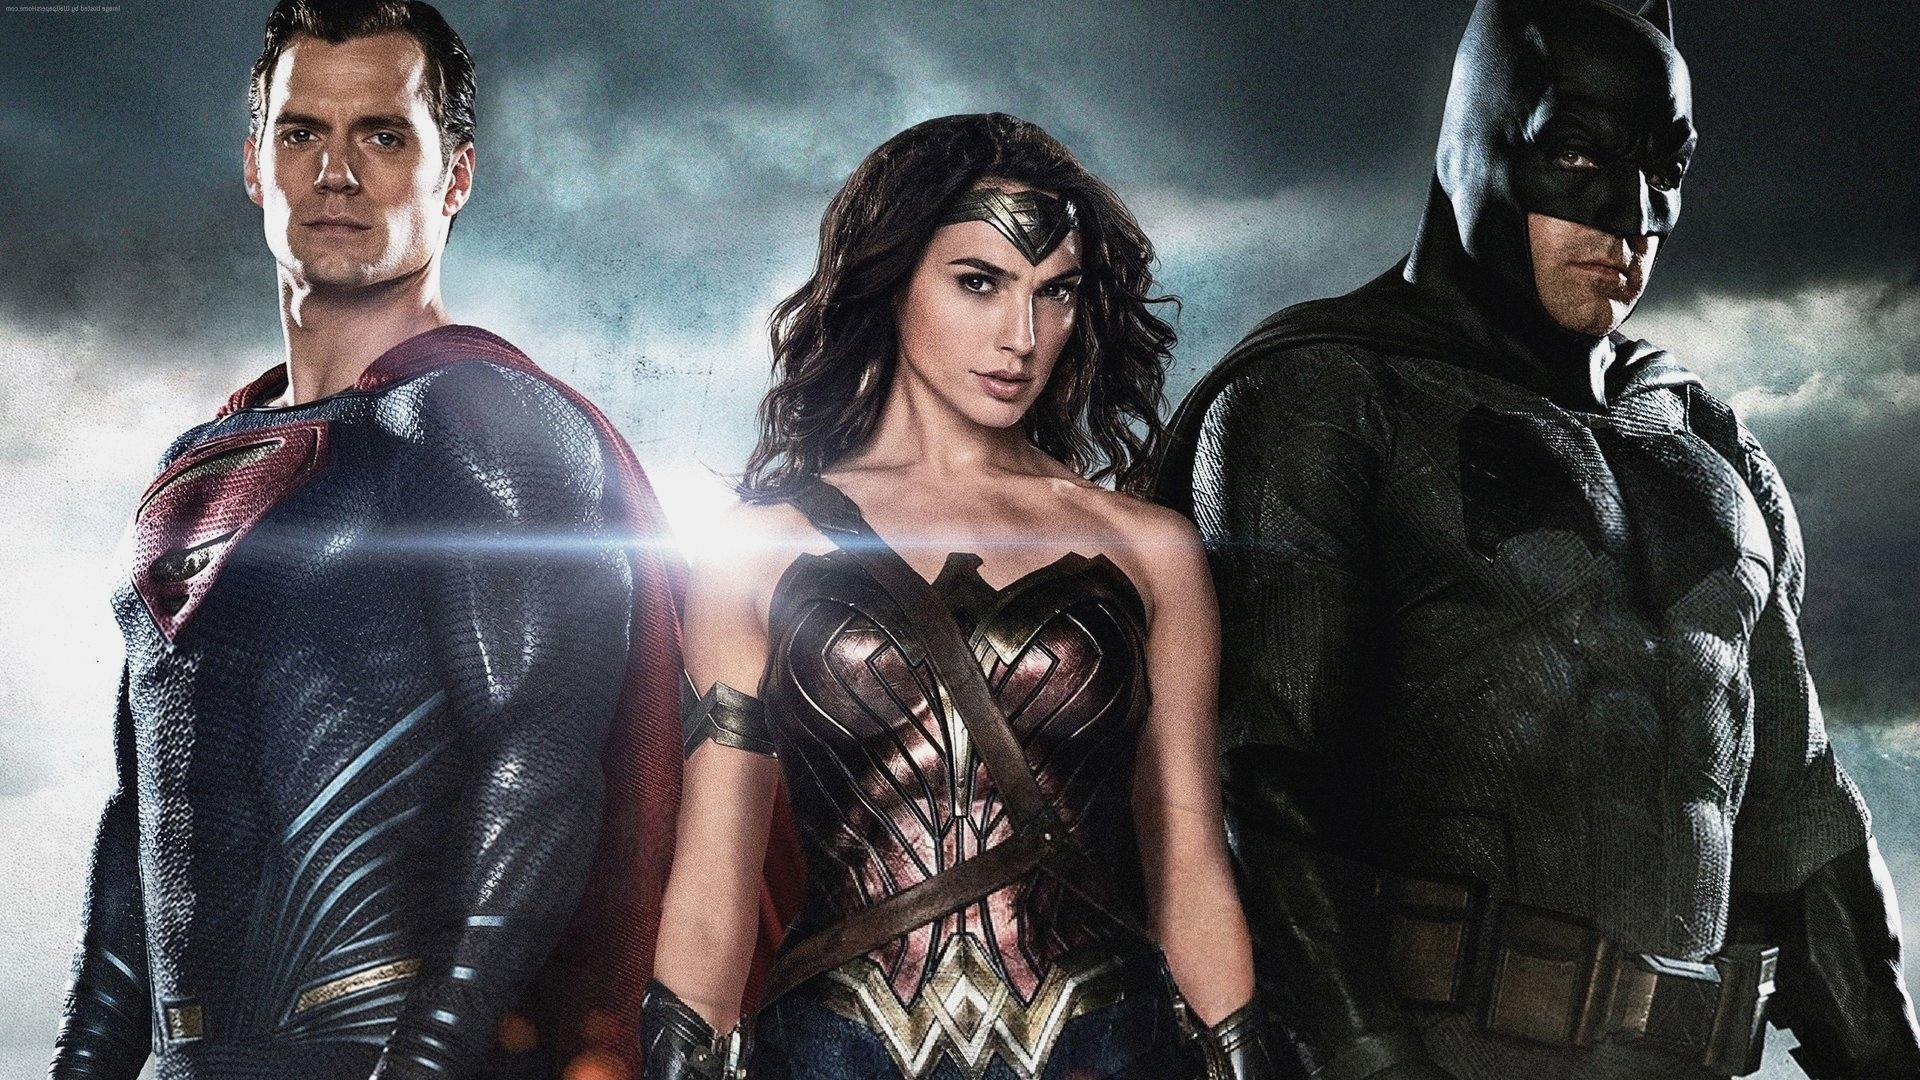 10 Superman Wallpaper Hd 4k Batman Vs Superman Wonder